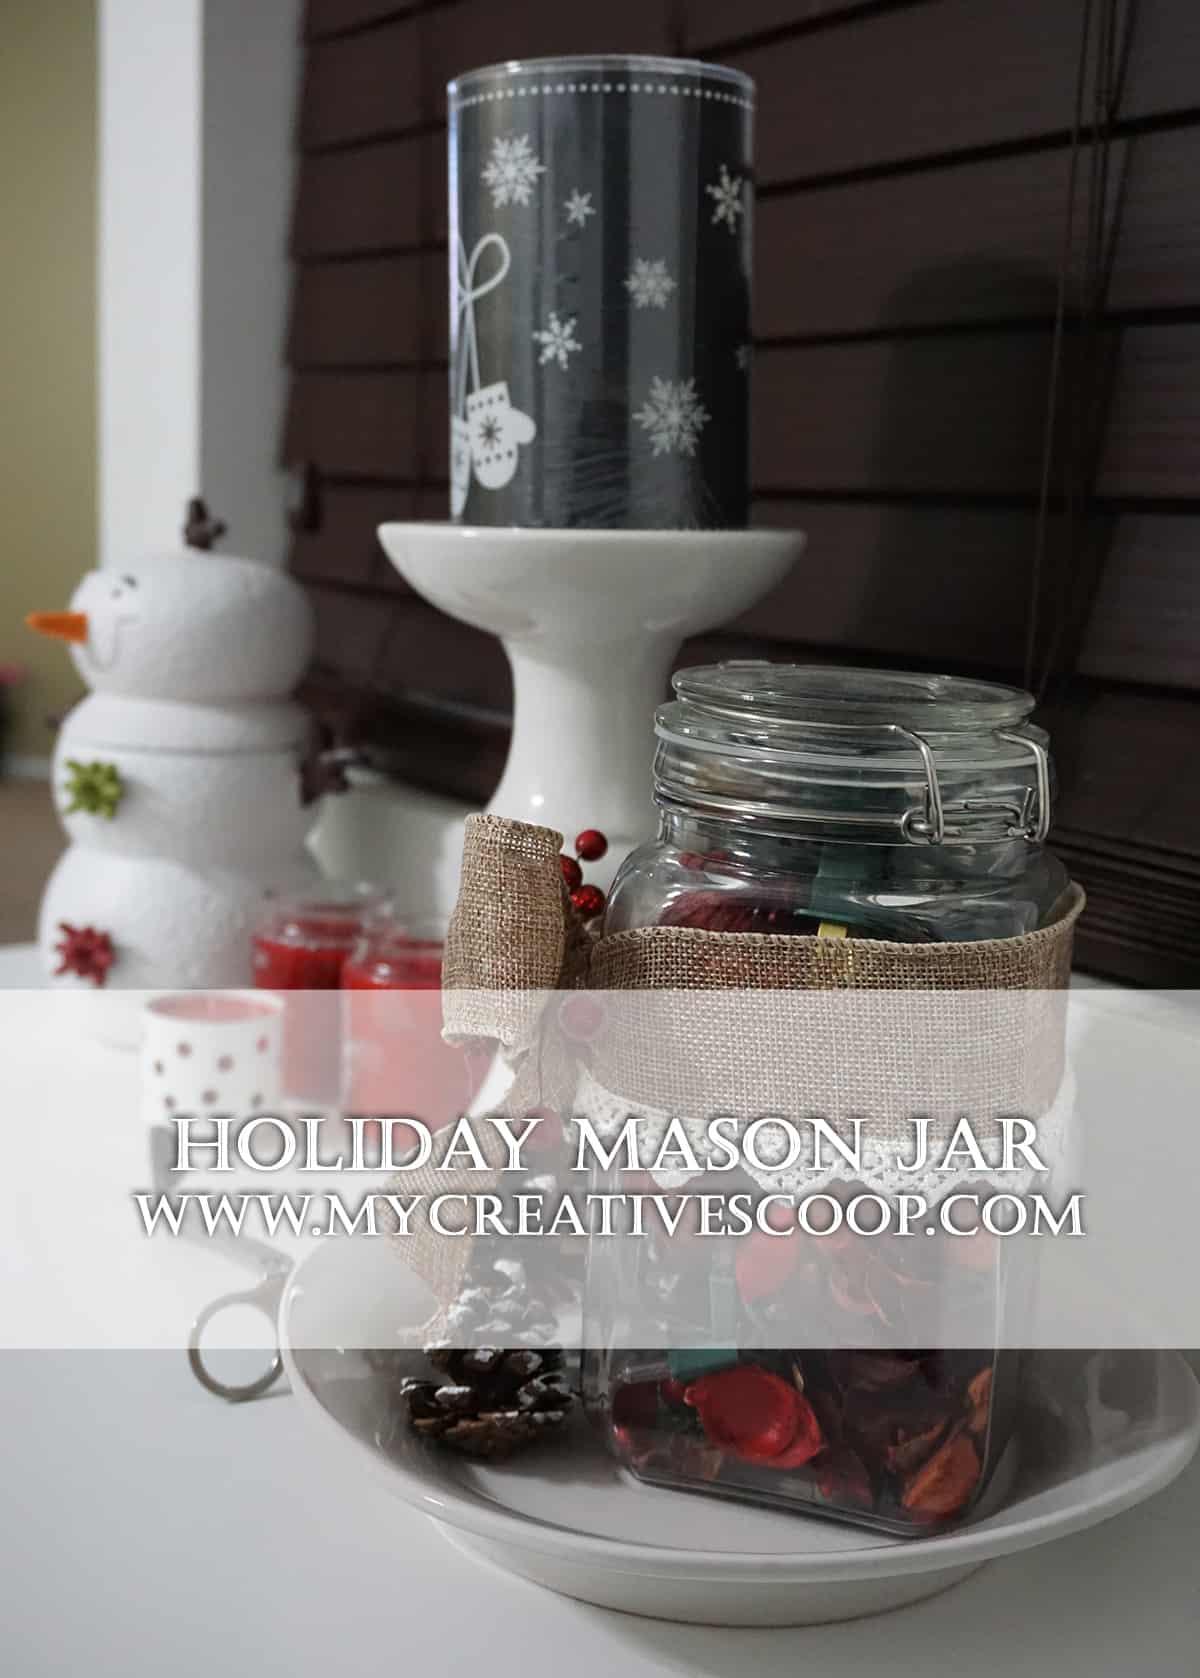 Holiday Mason Jar – 5 Minute Crafts